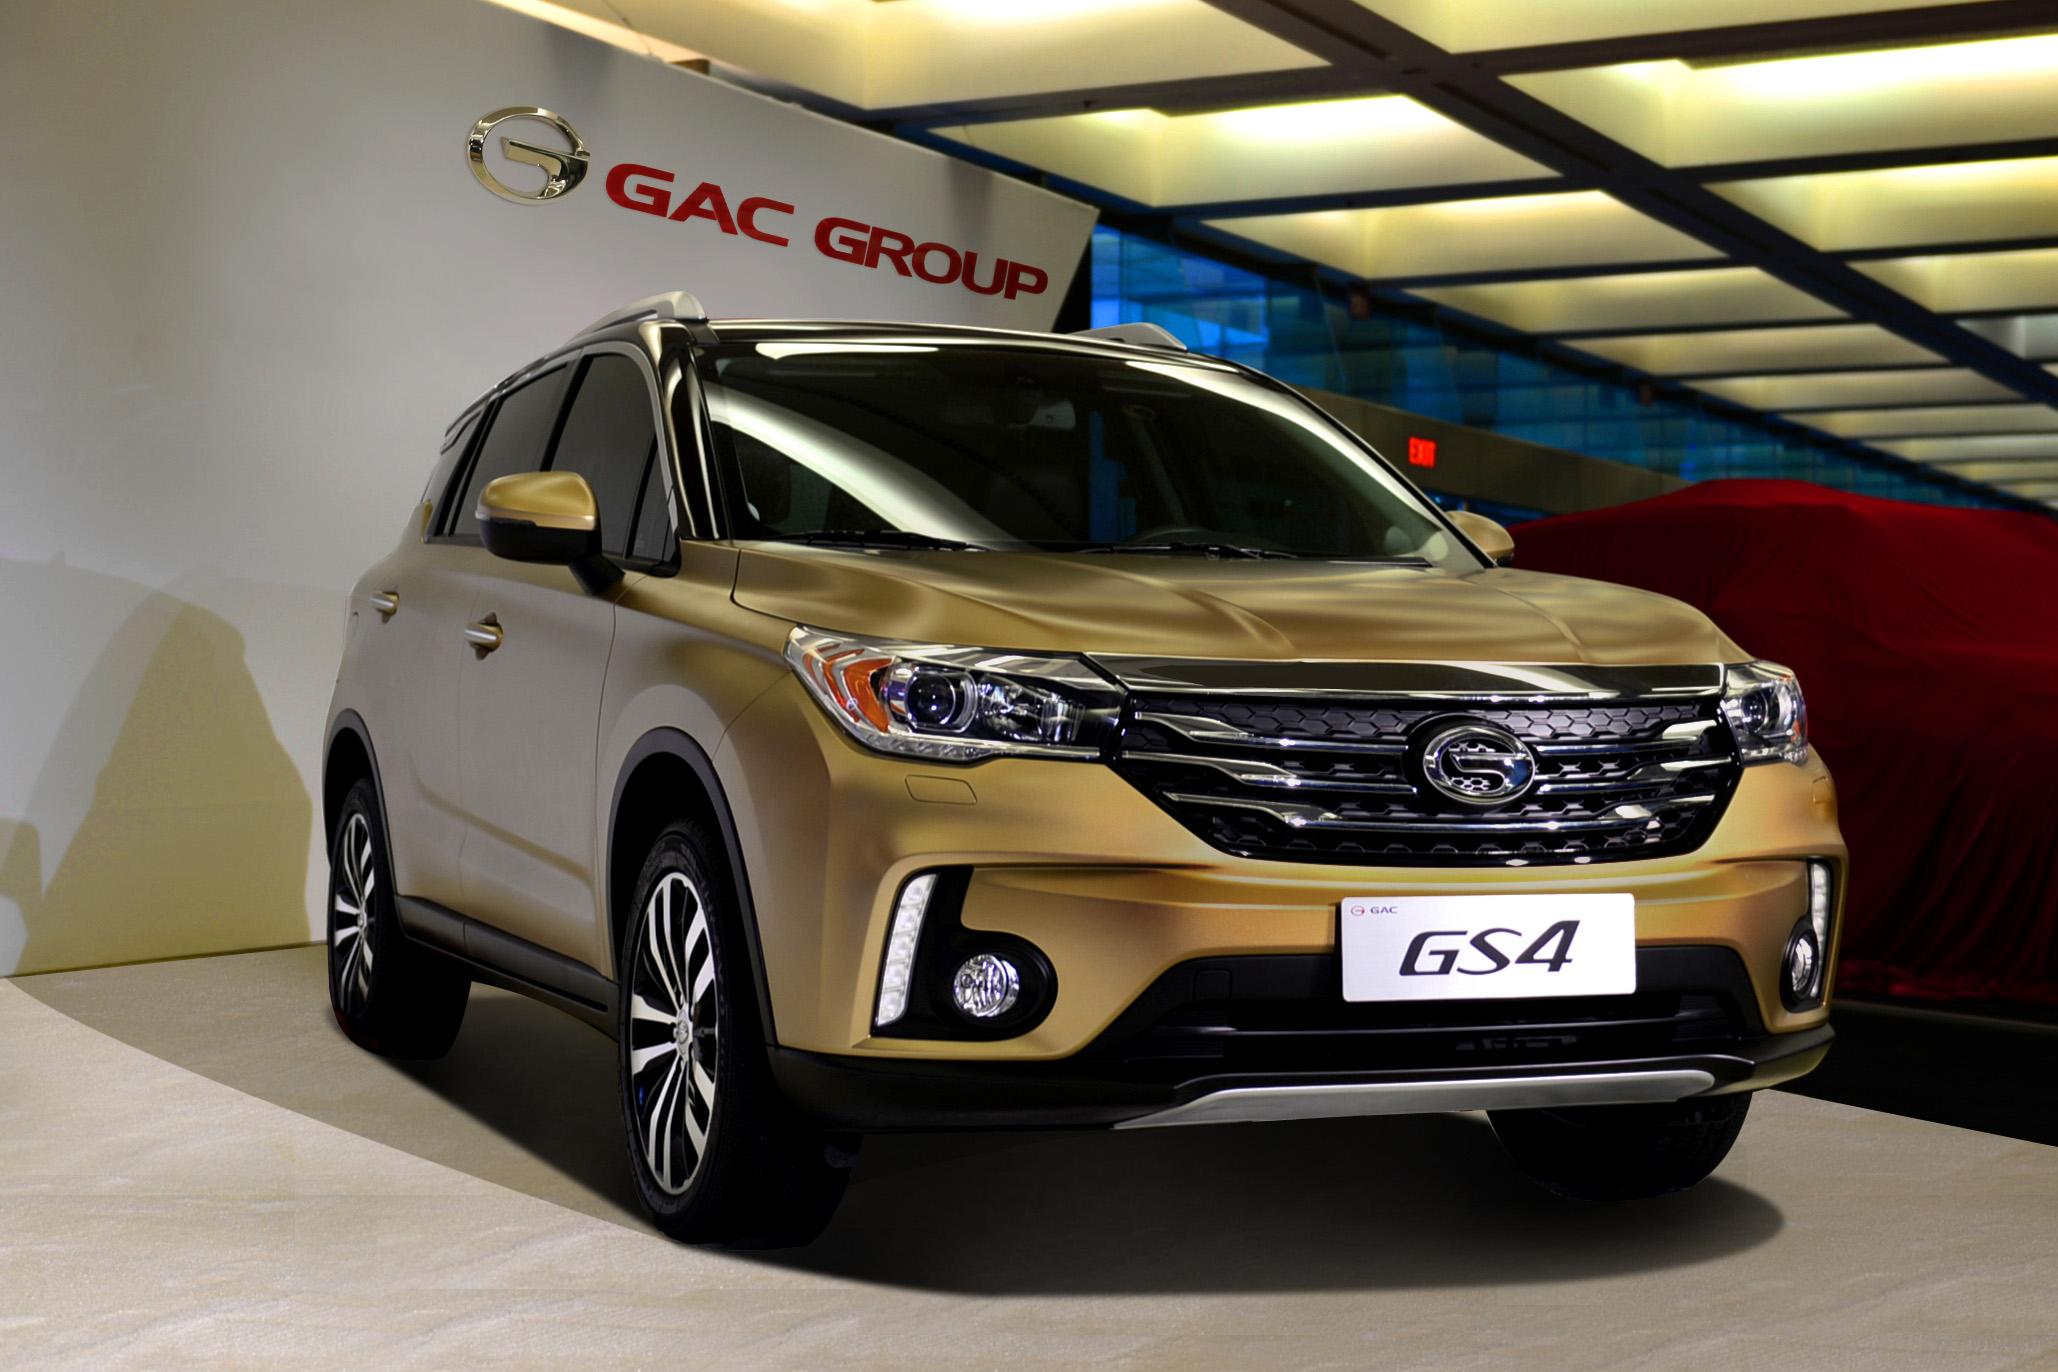 Gac Motors